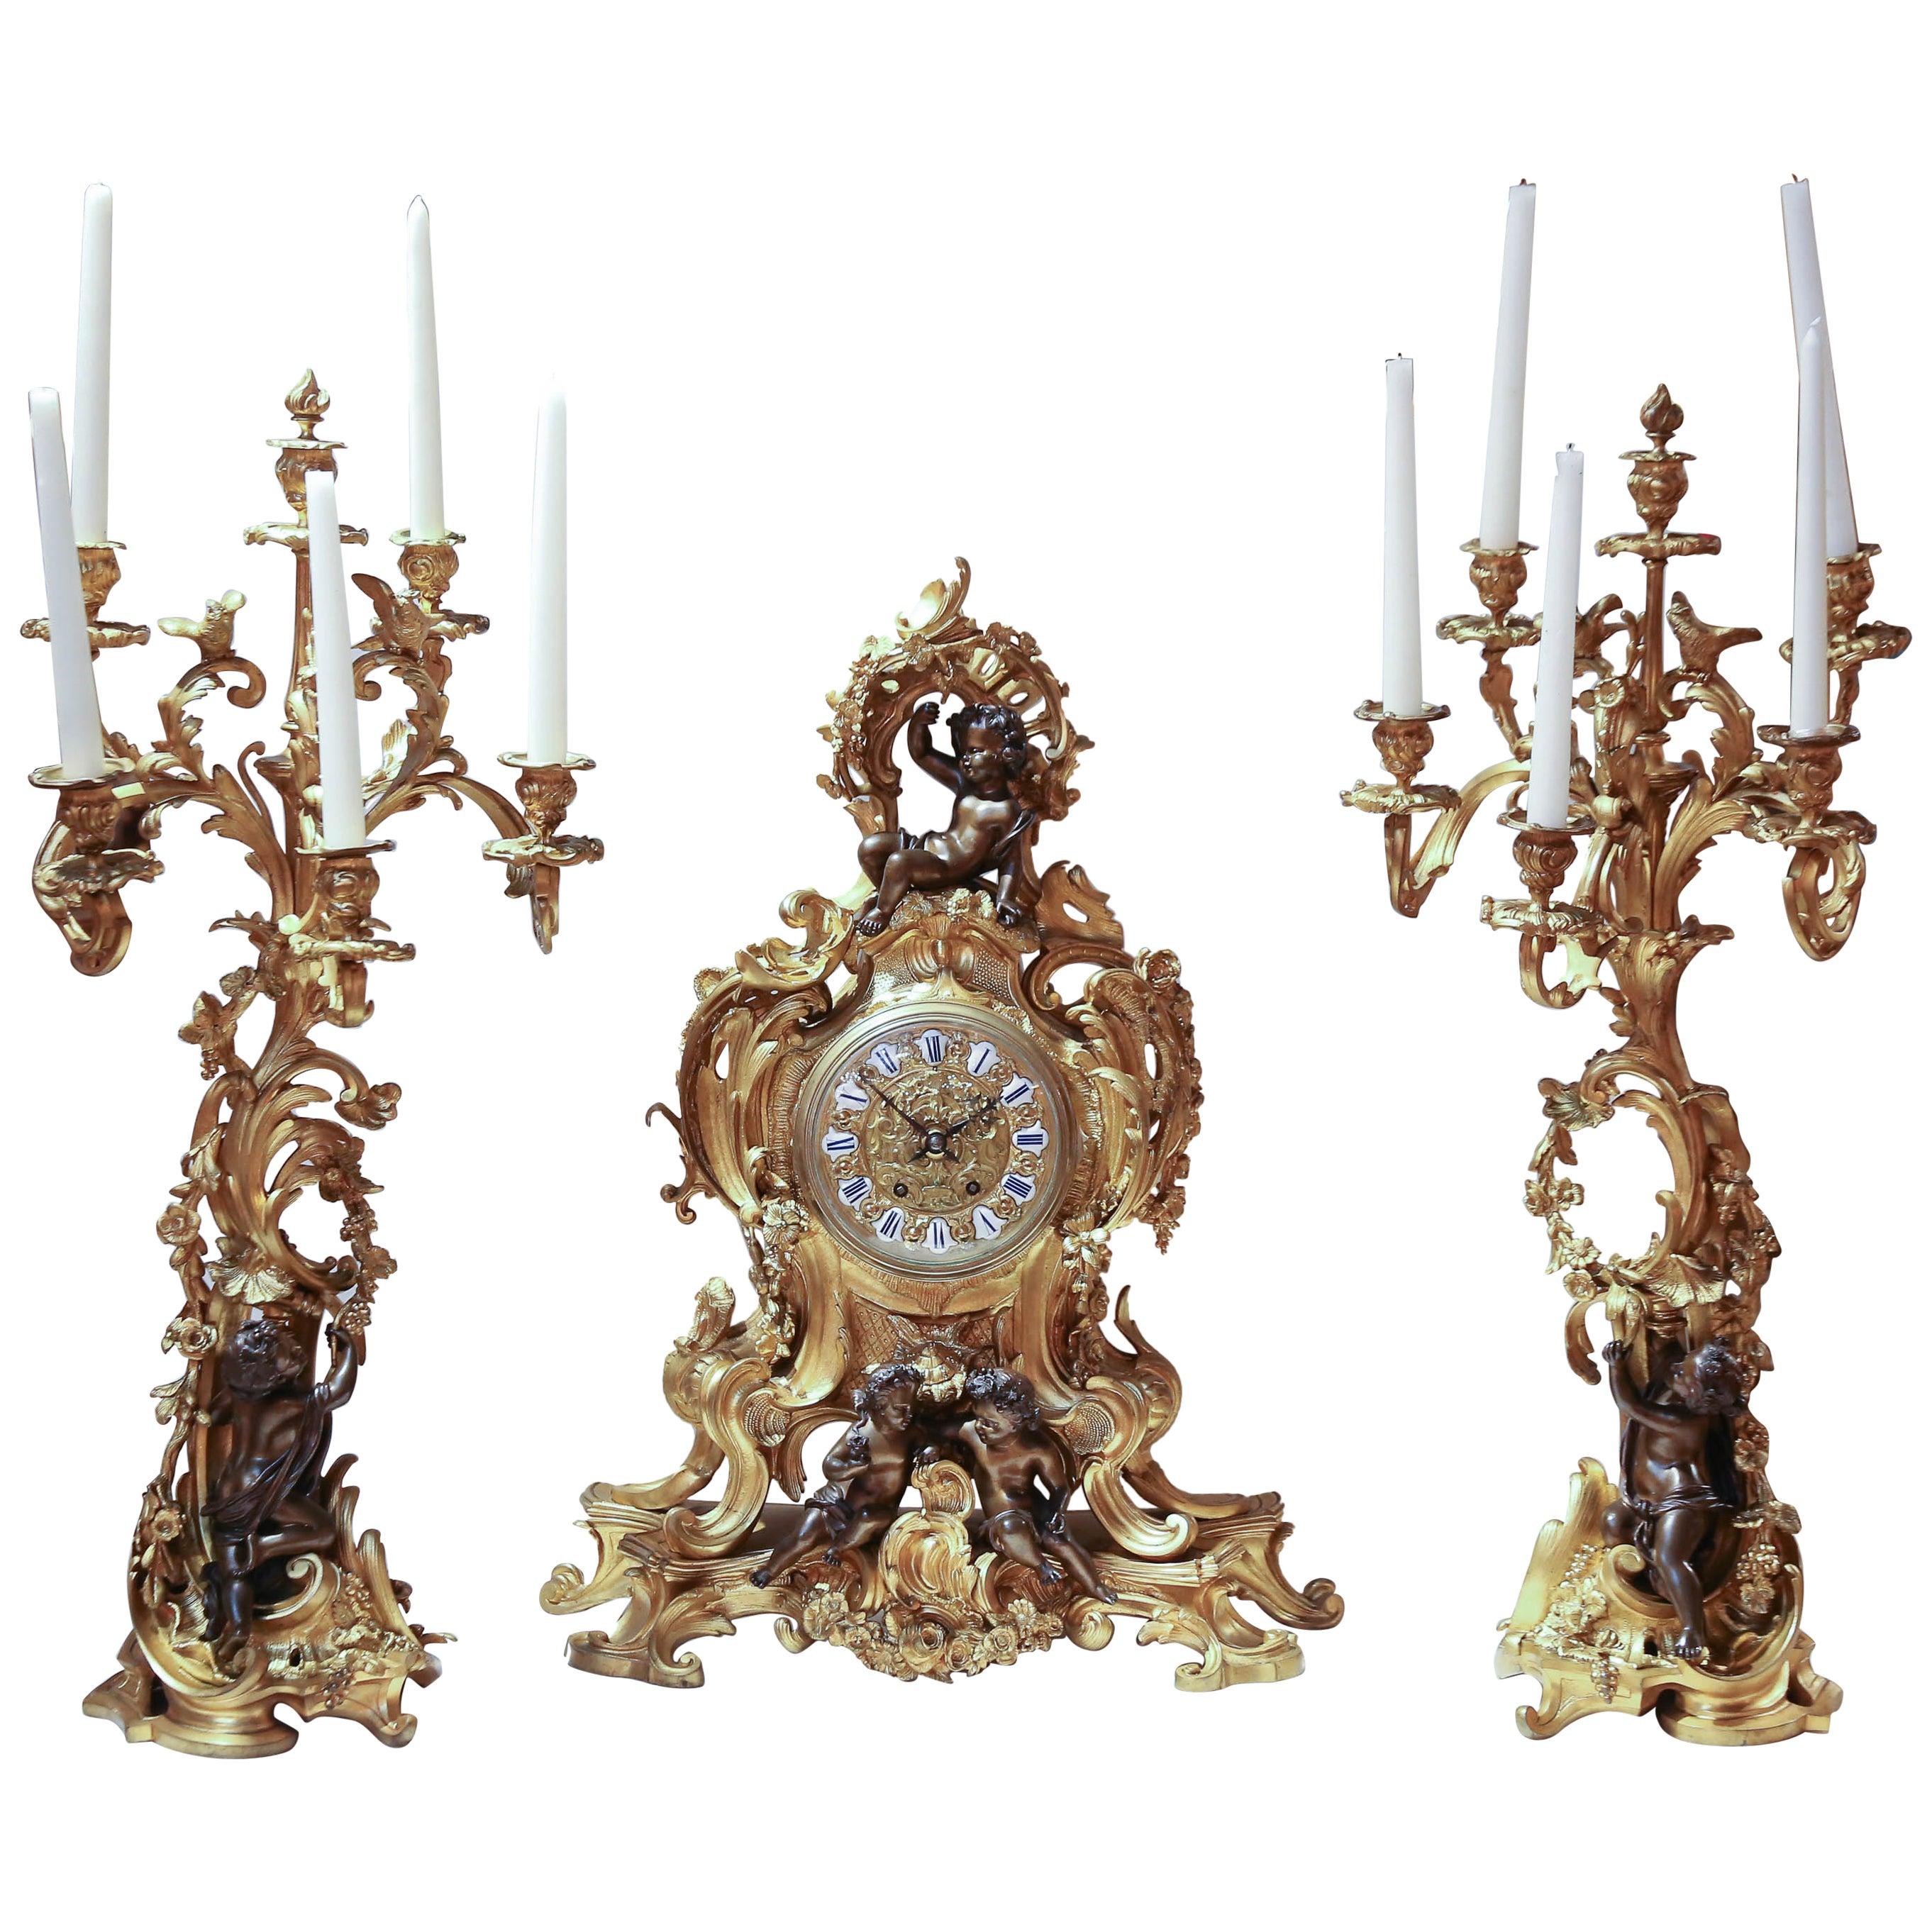 19th Century Three-Piece Clock Garniture Set, Gilt Bronze and Patinated Bronze